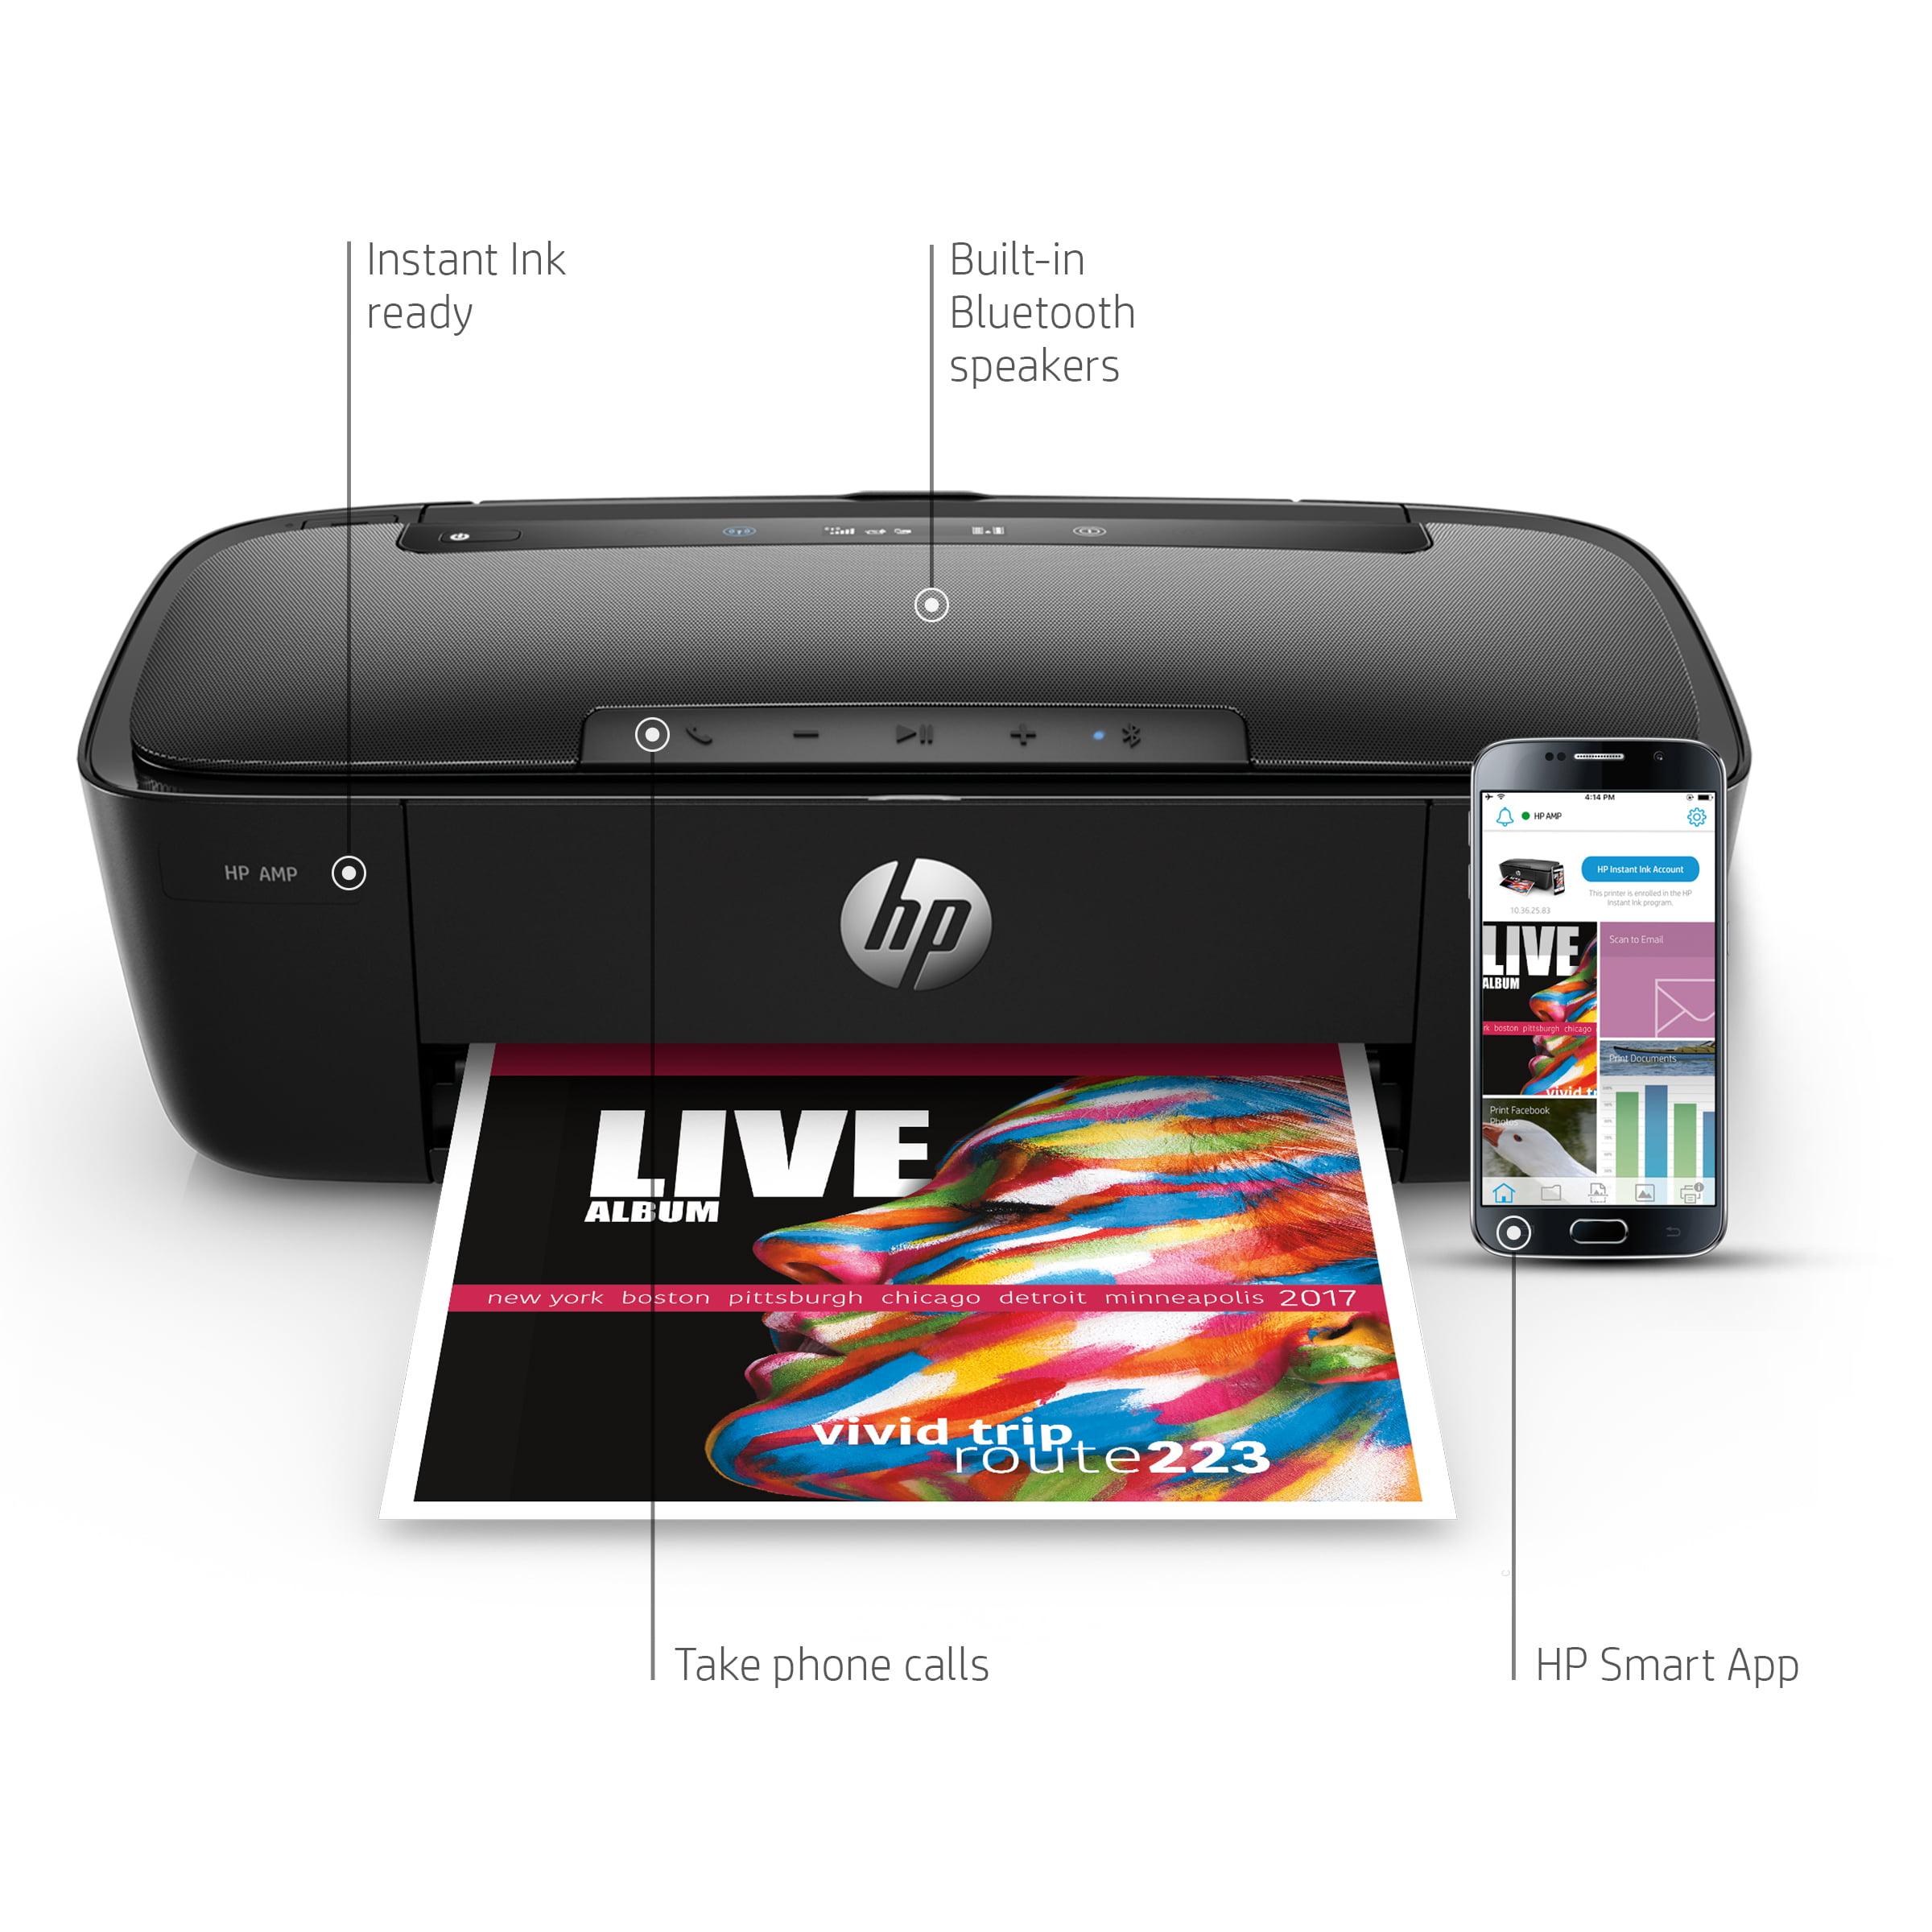 HP AMP 100 Printer with built-in Bluetooth speaker - Walmart.com Exclusive